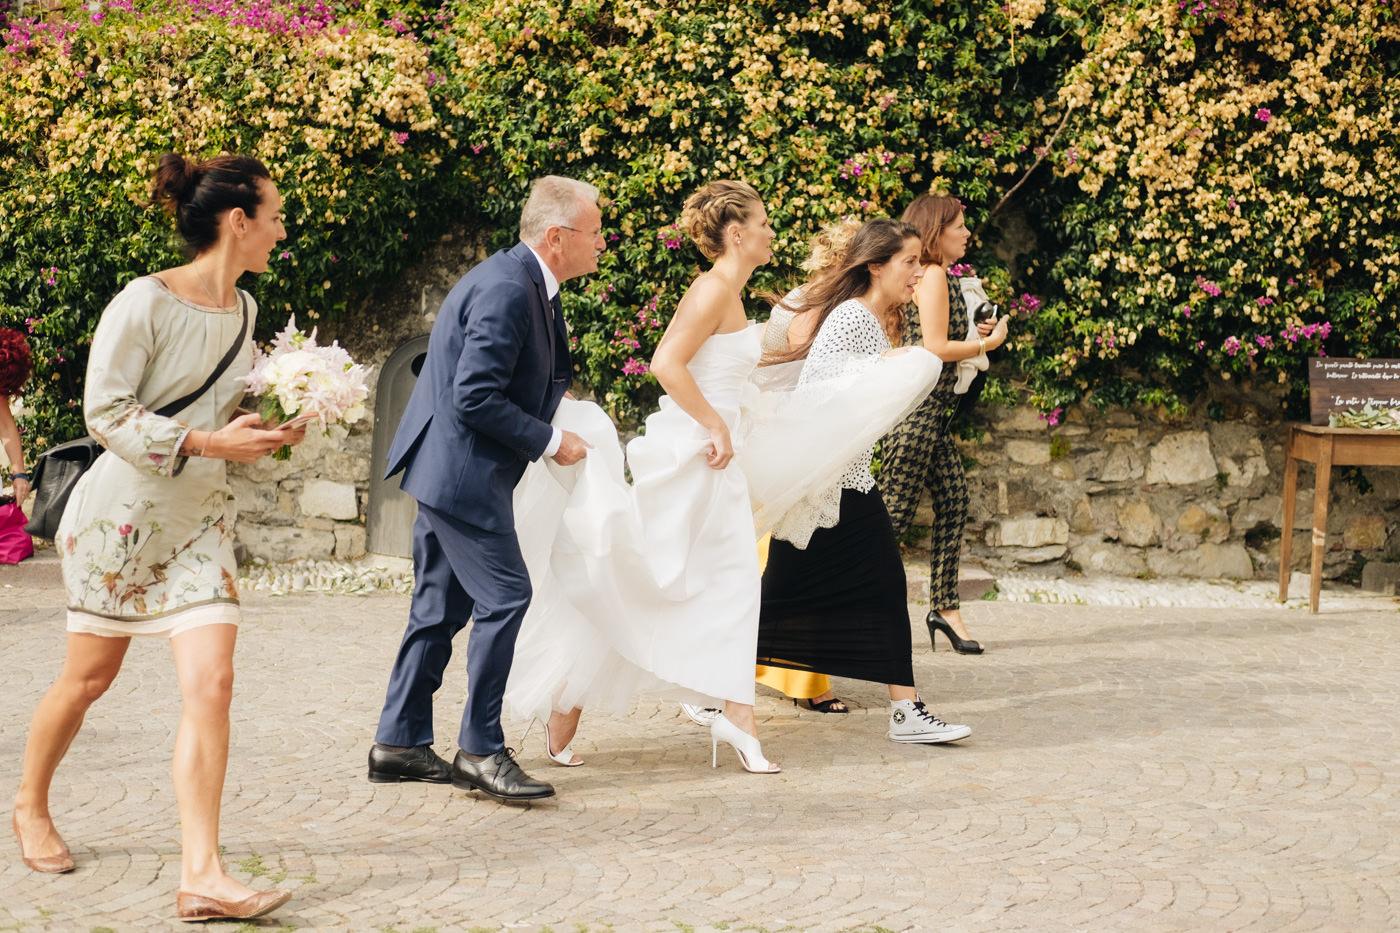 matrimoni_all_italiana_fotografo_matrimonio_cinque_terre-20.jpg